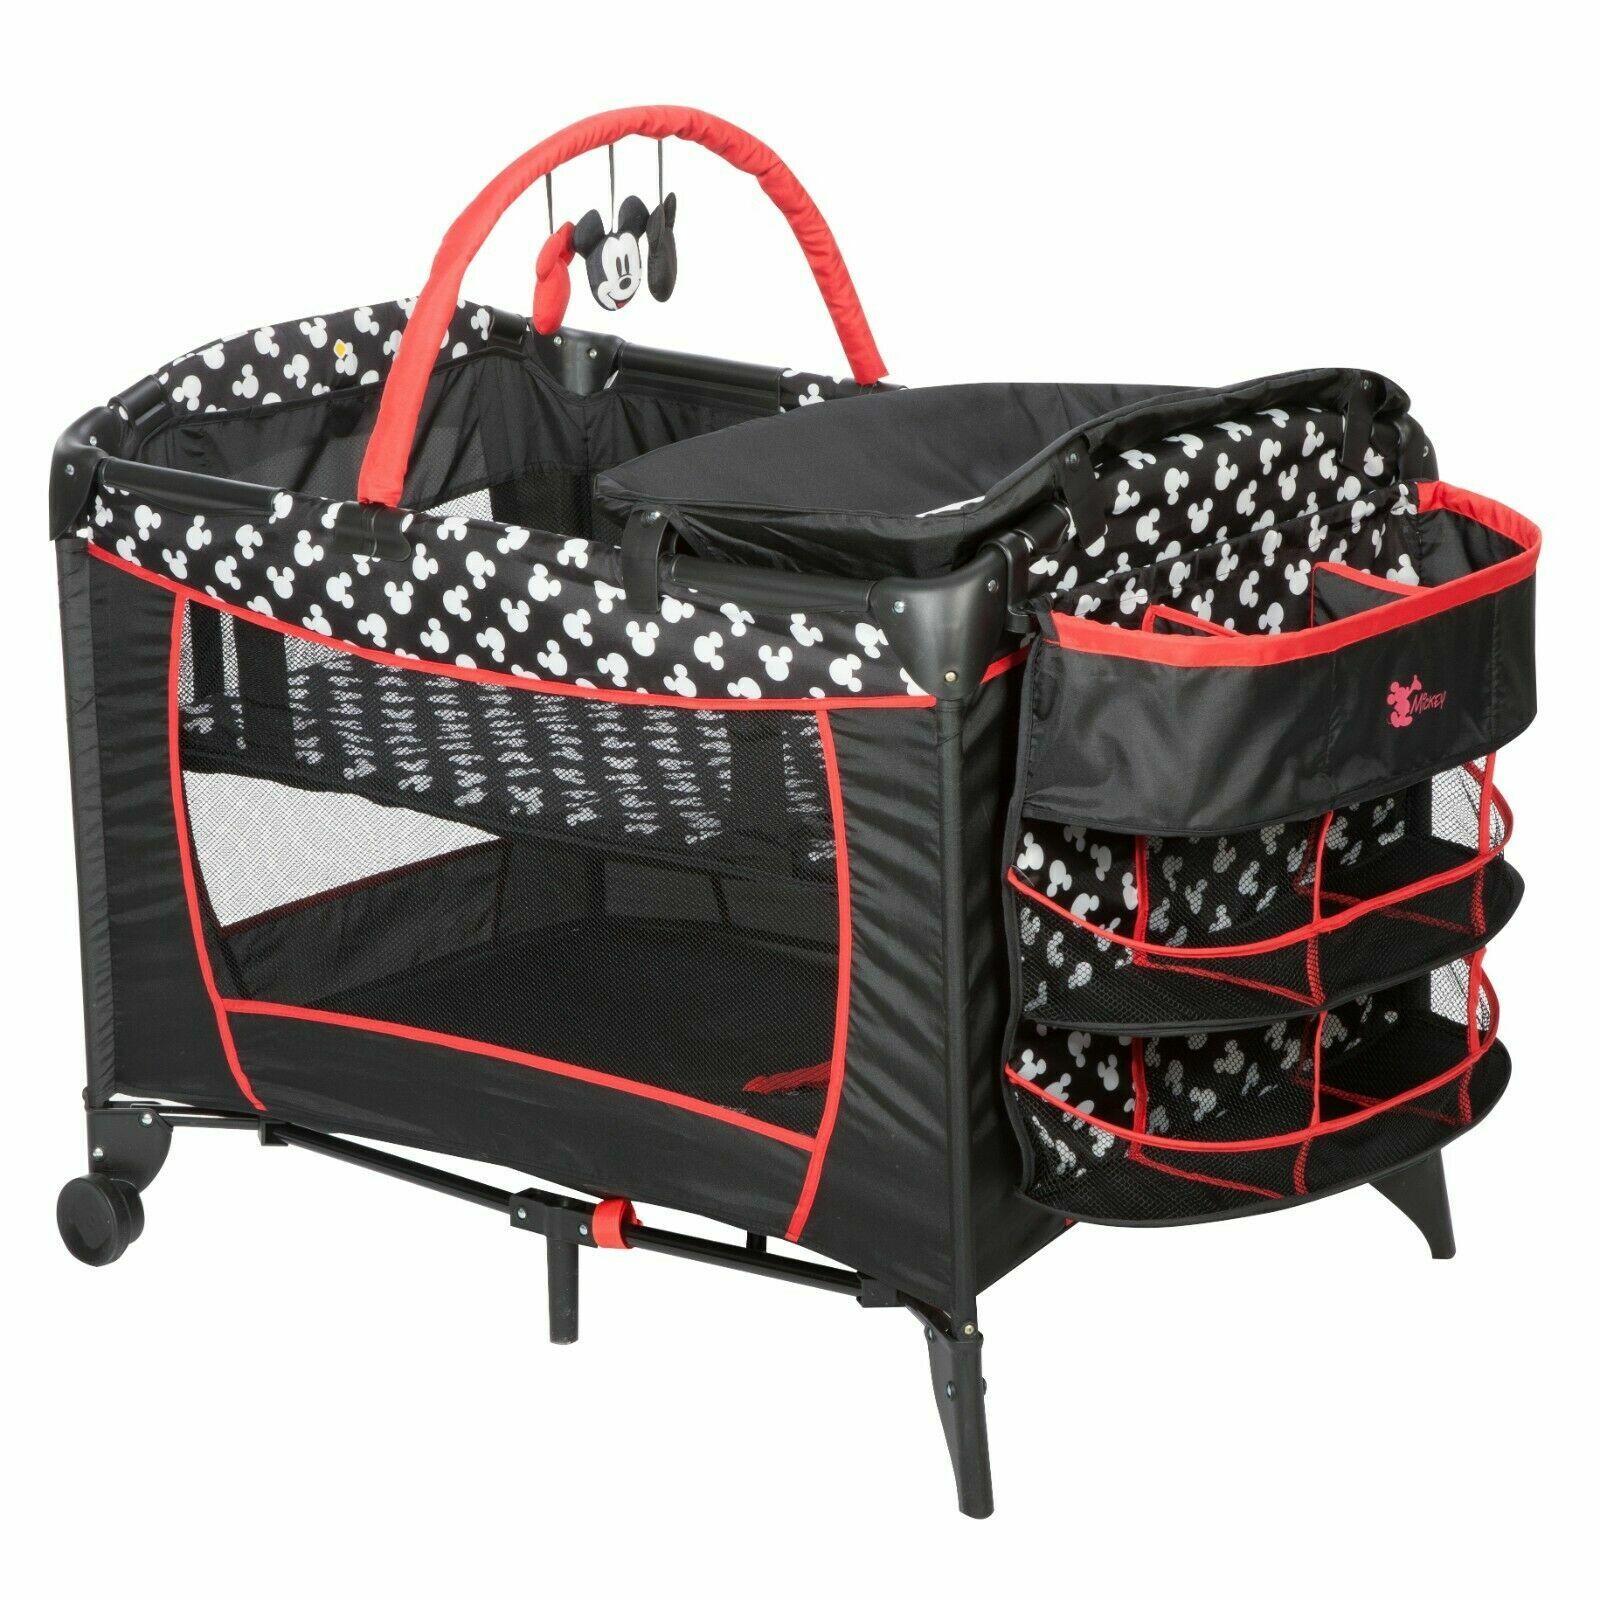 Folding Cot Infant Nursery Center Crib Playpen Playard Porta